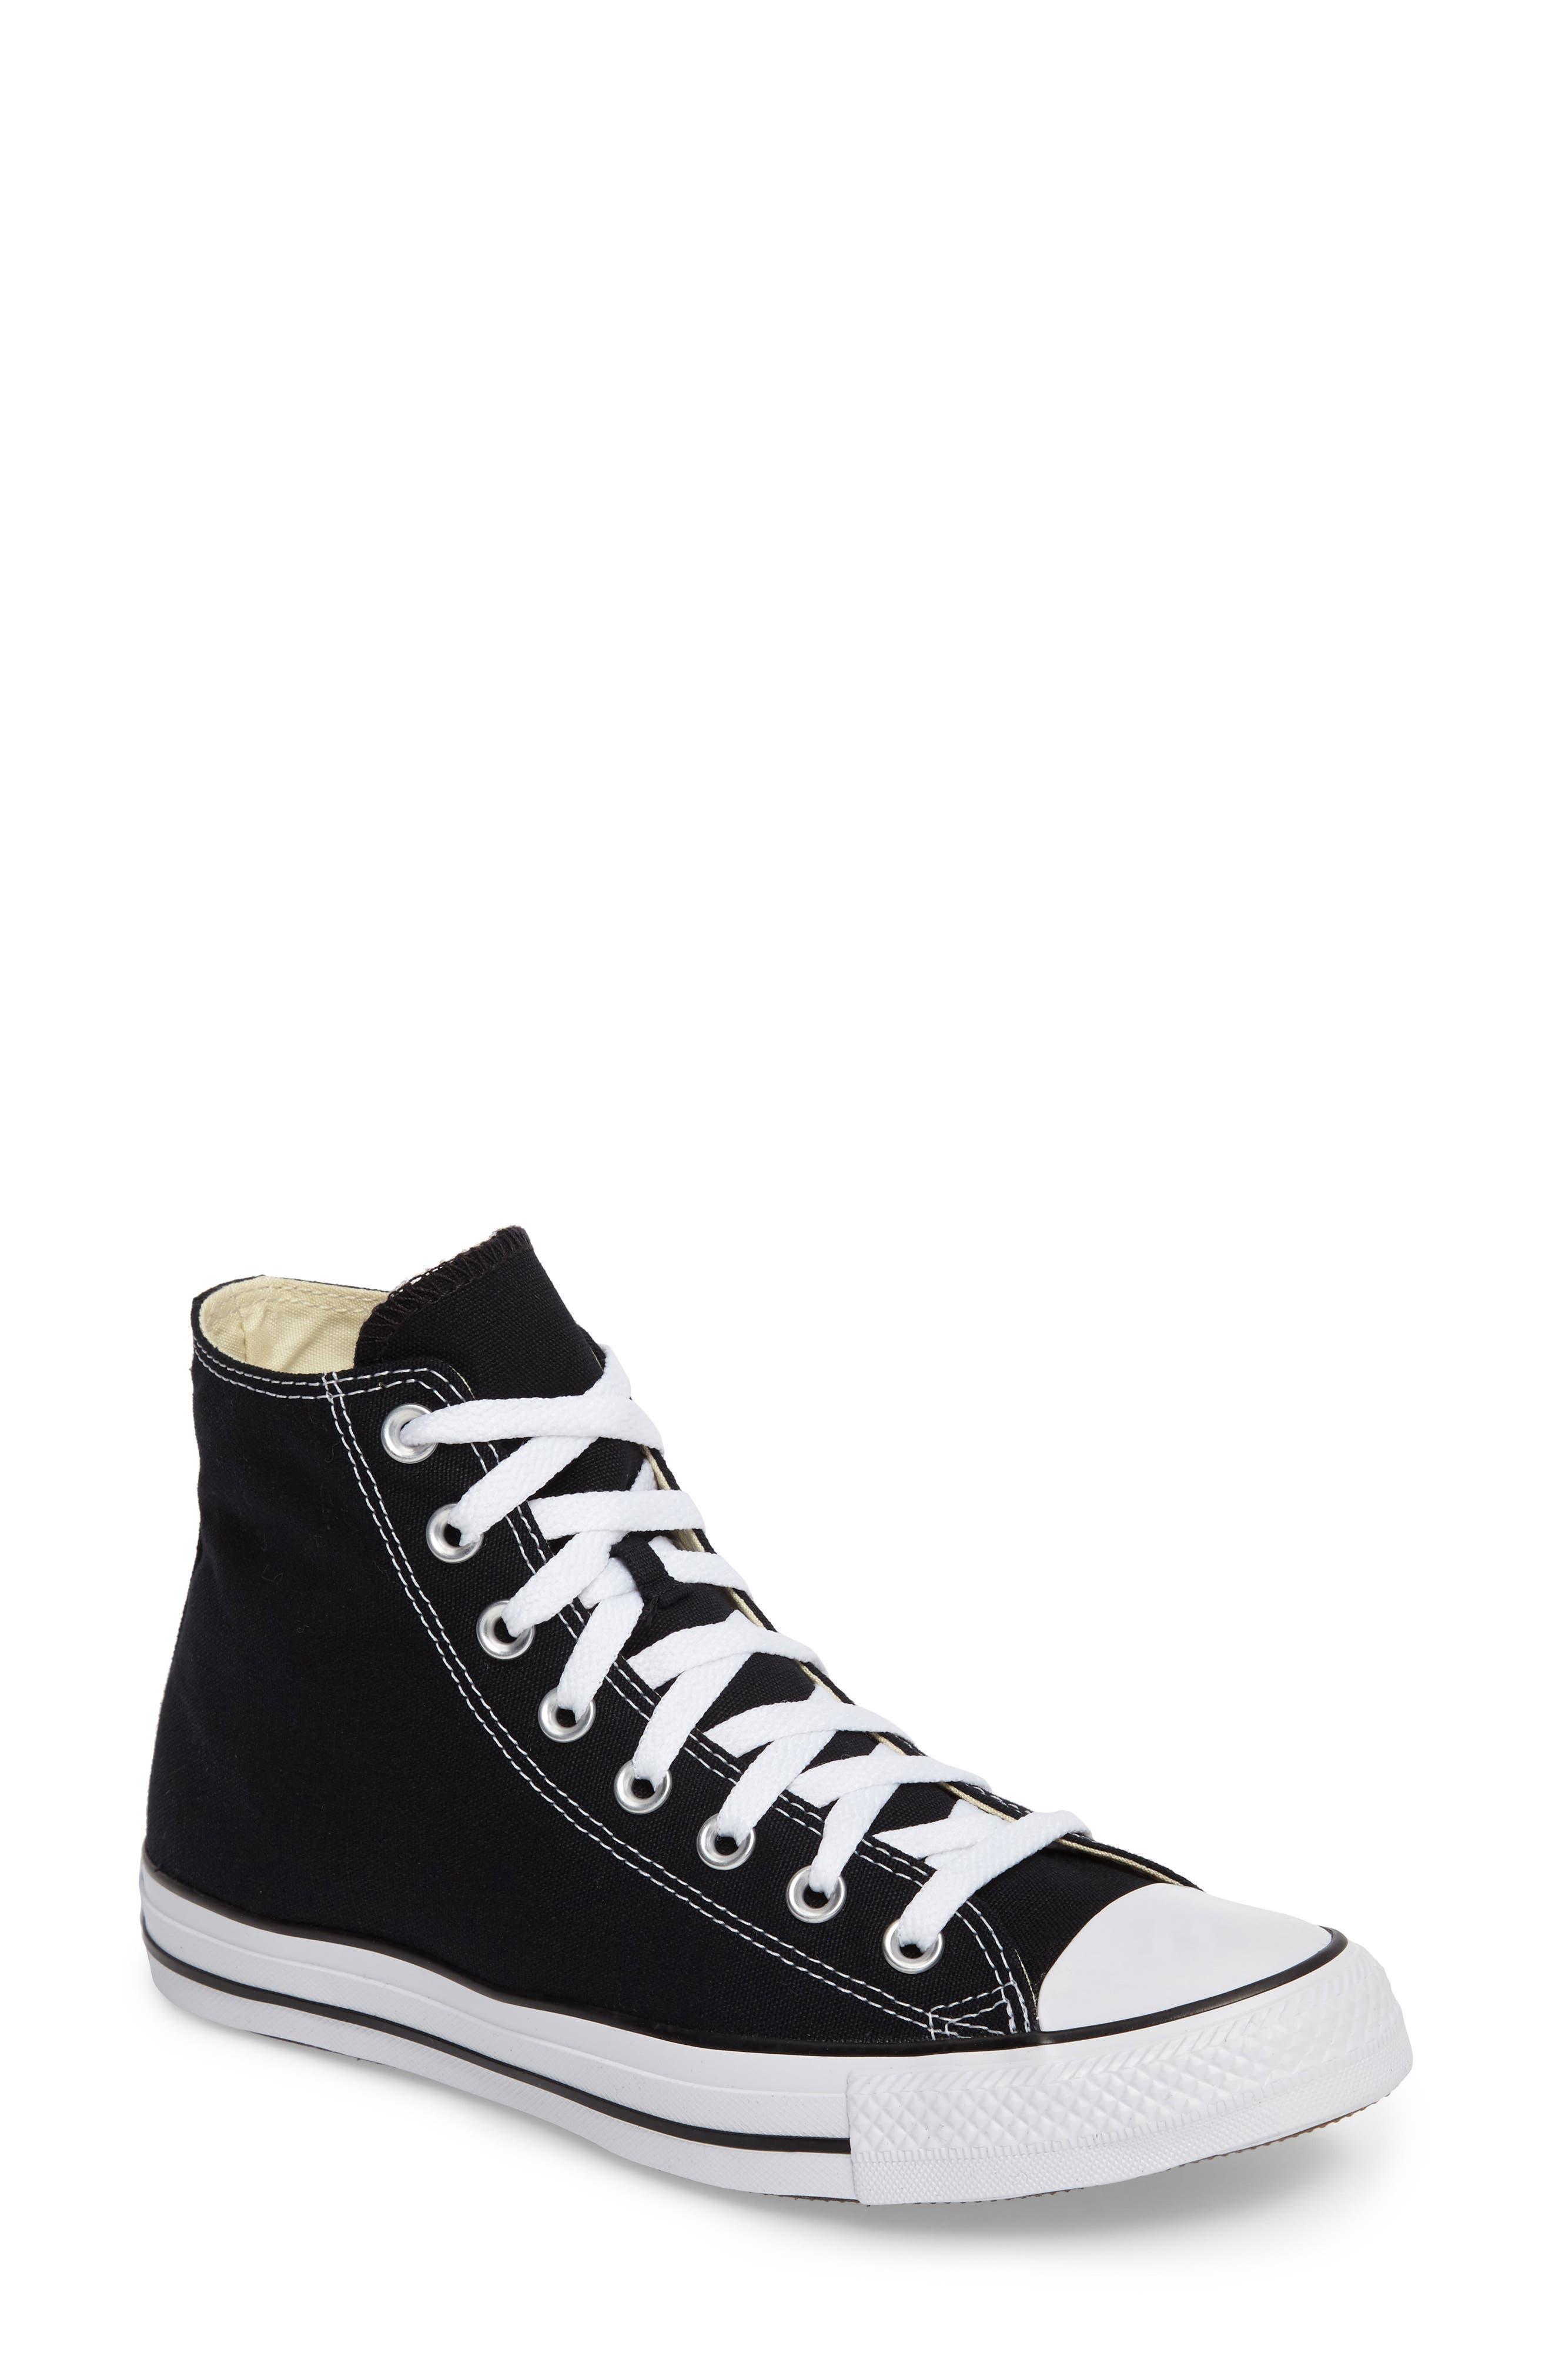 Converse Chuck Taylor High Top Sneaker, Black